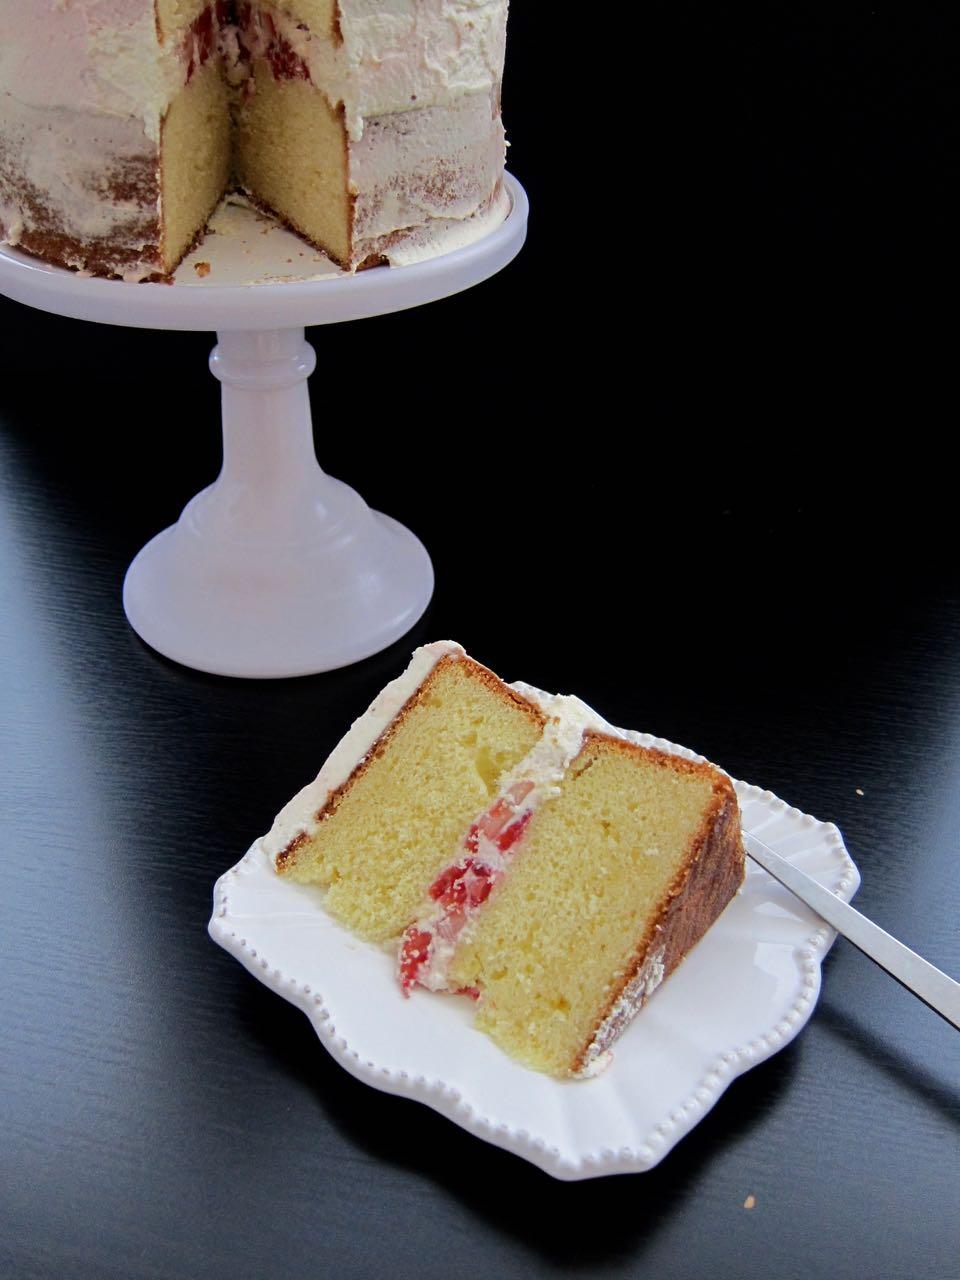 sliced strawberries & cream cake